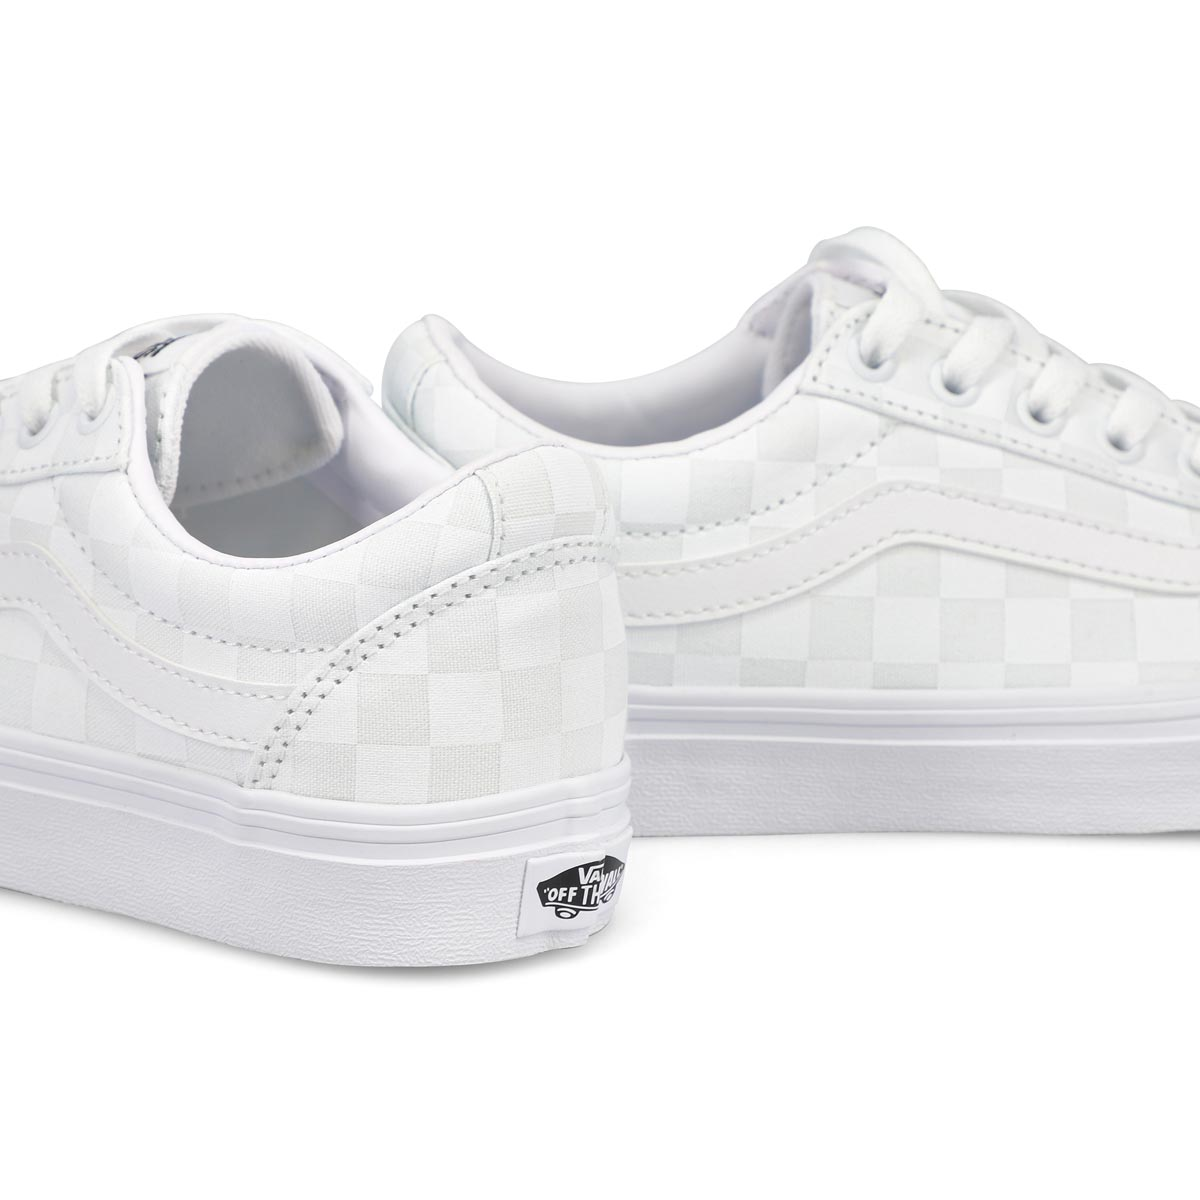 Women's Ward Sneaker - Checkered White/White